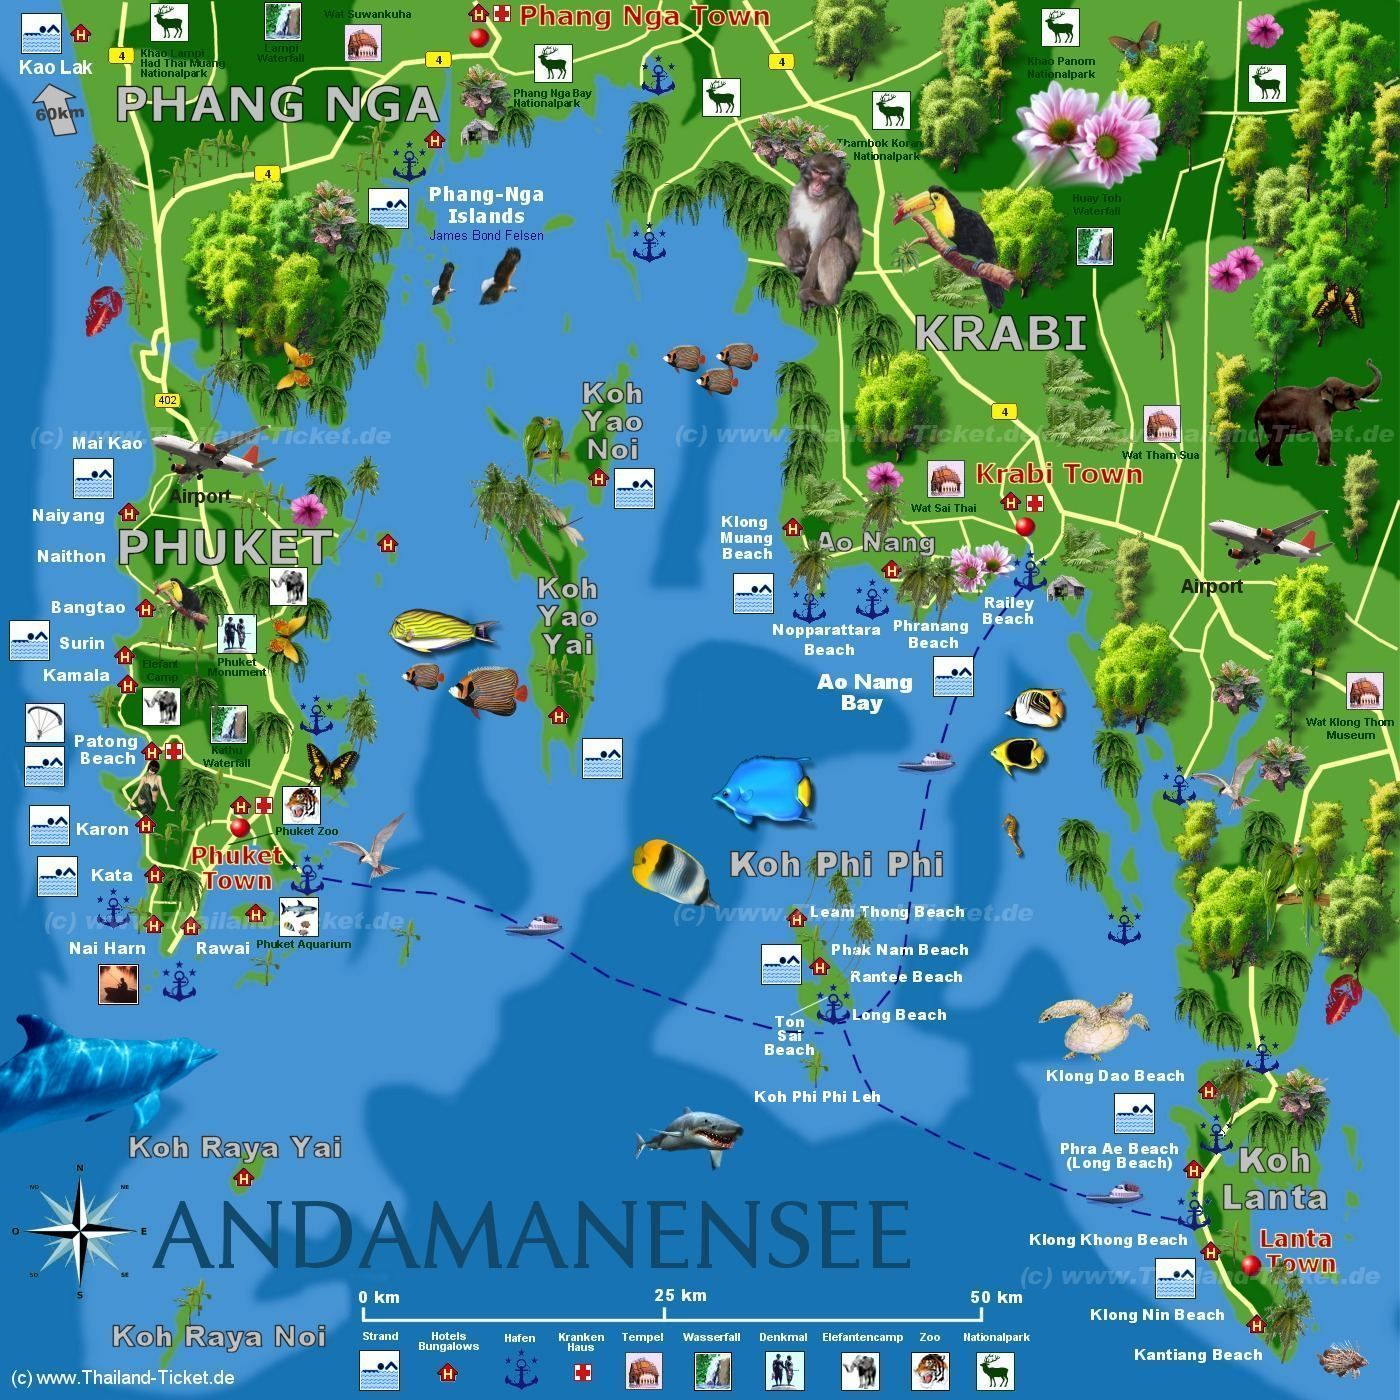 Karte Thailand Krabi Krabi Thailand